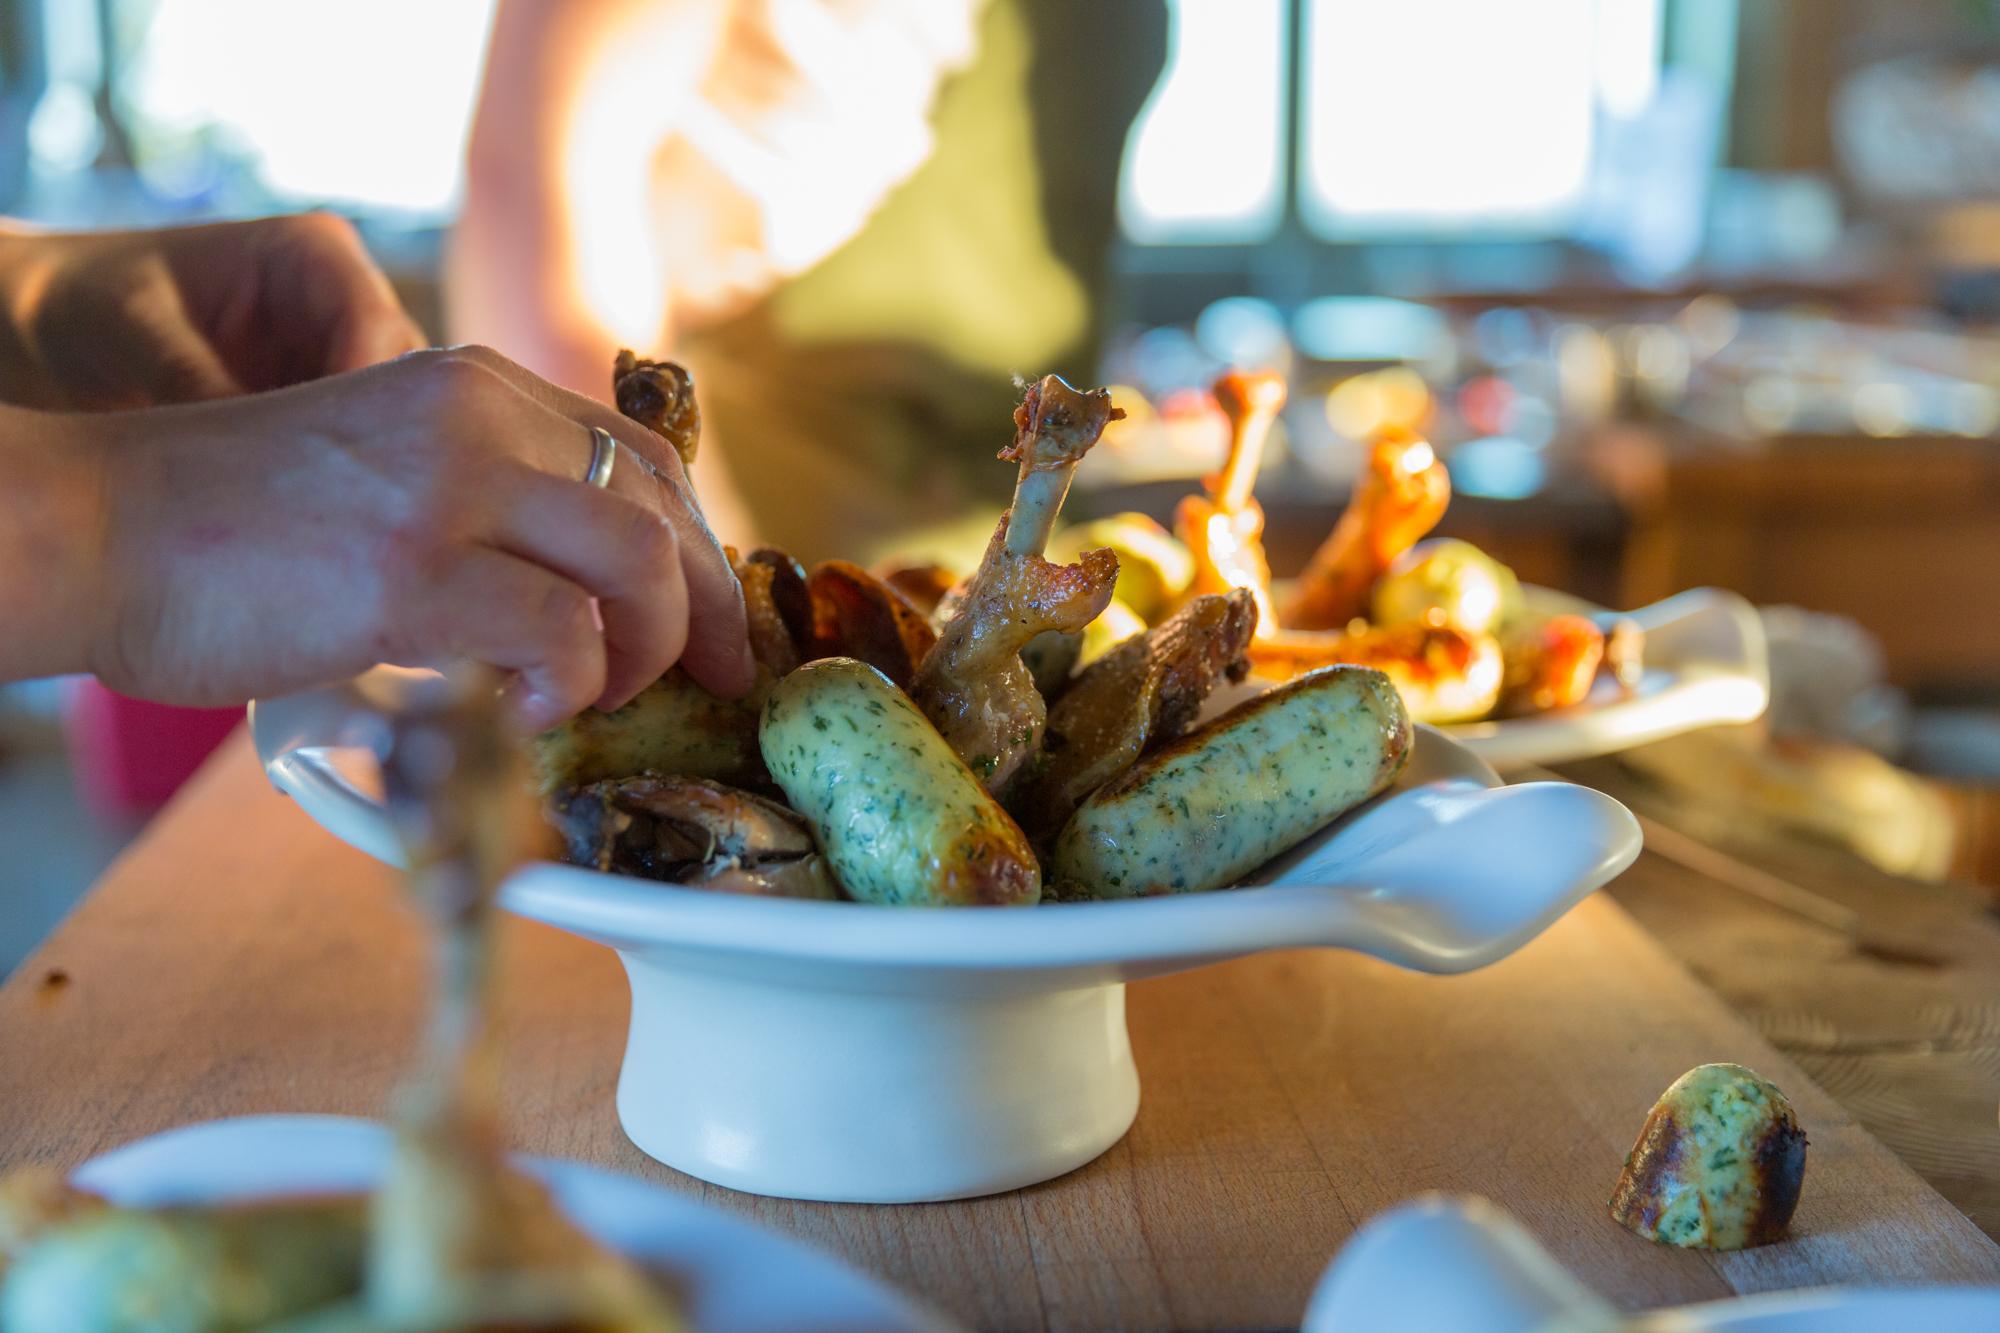 c stoll soter ipnc 2018 serving dish handmande.jpg